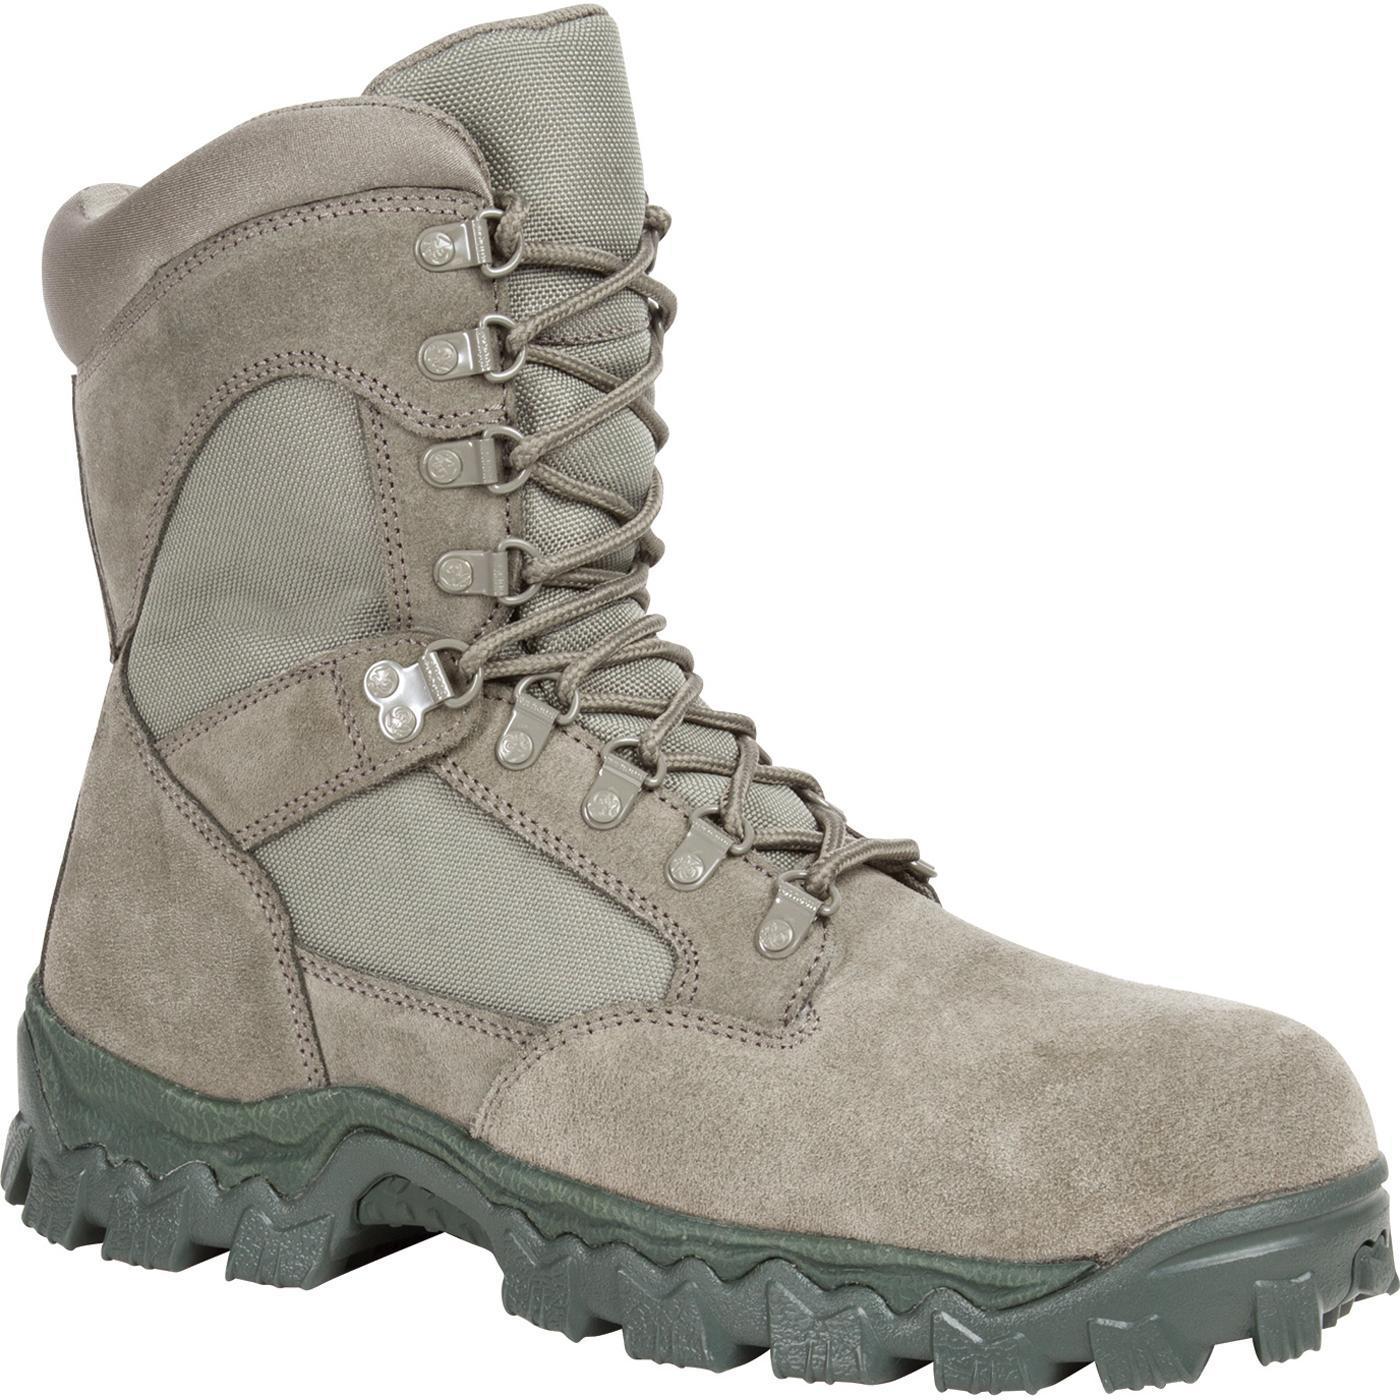 d5a1b9d6b17 Rocky Alpha Force Composite Toe Sage Green Boot